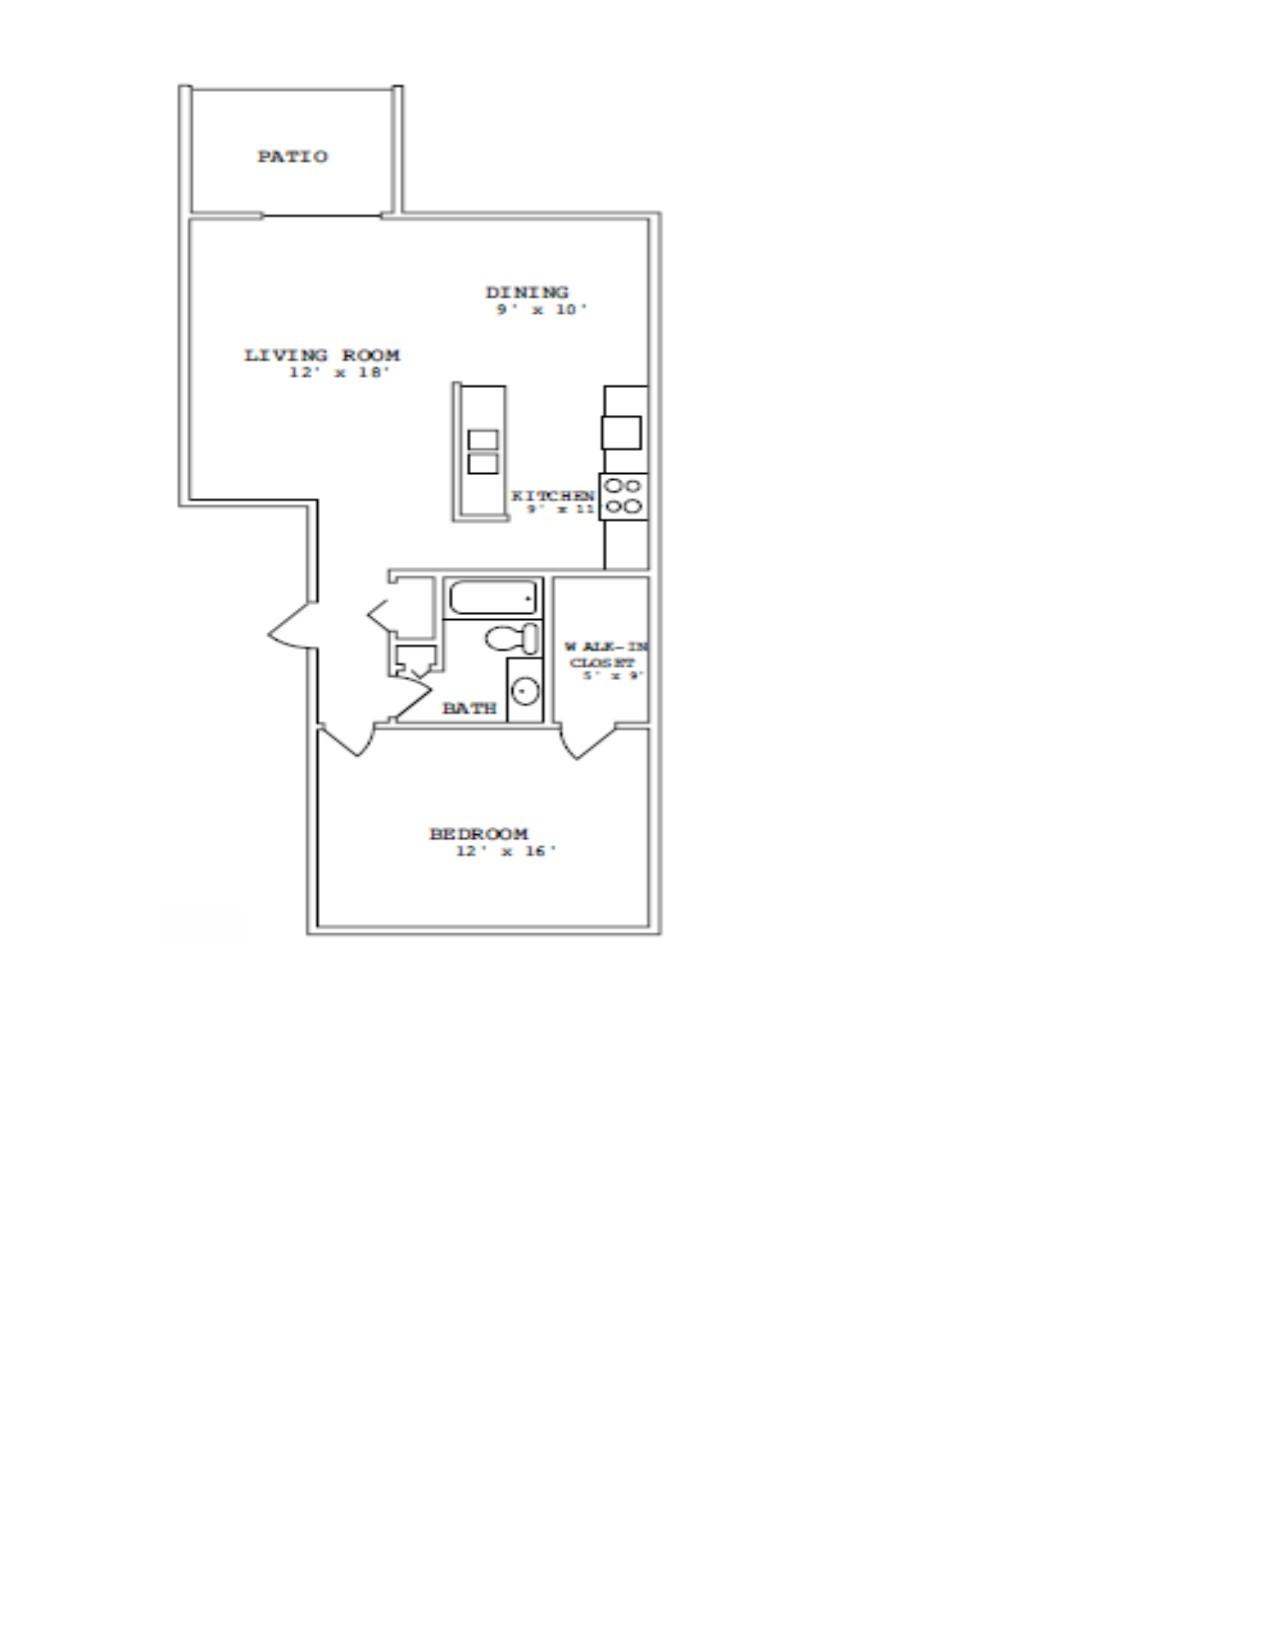 890-13 Floorplan